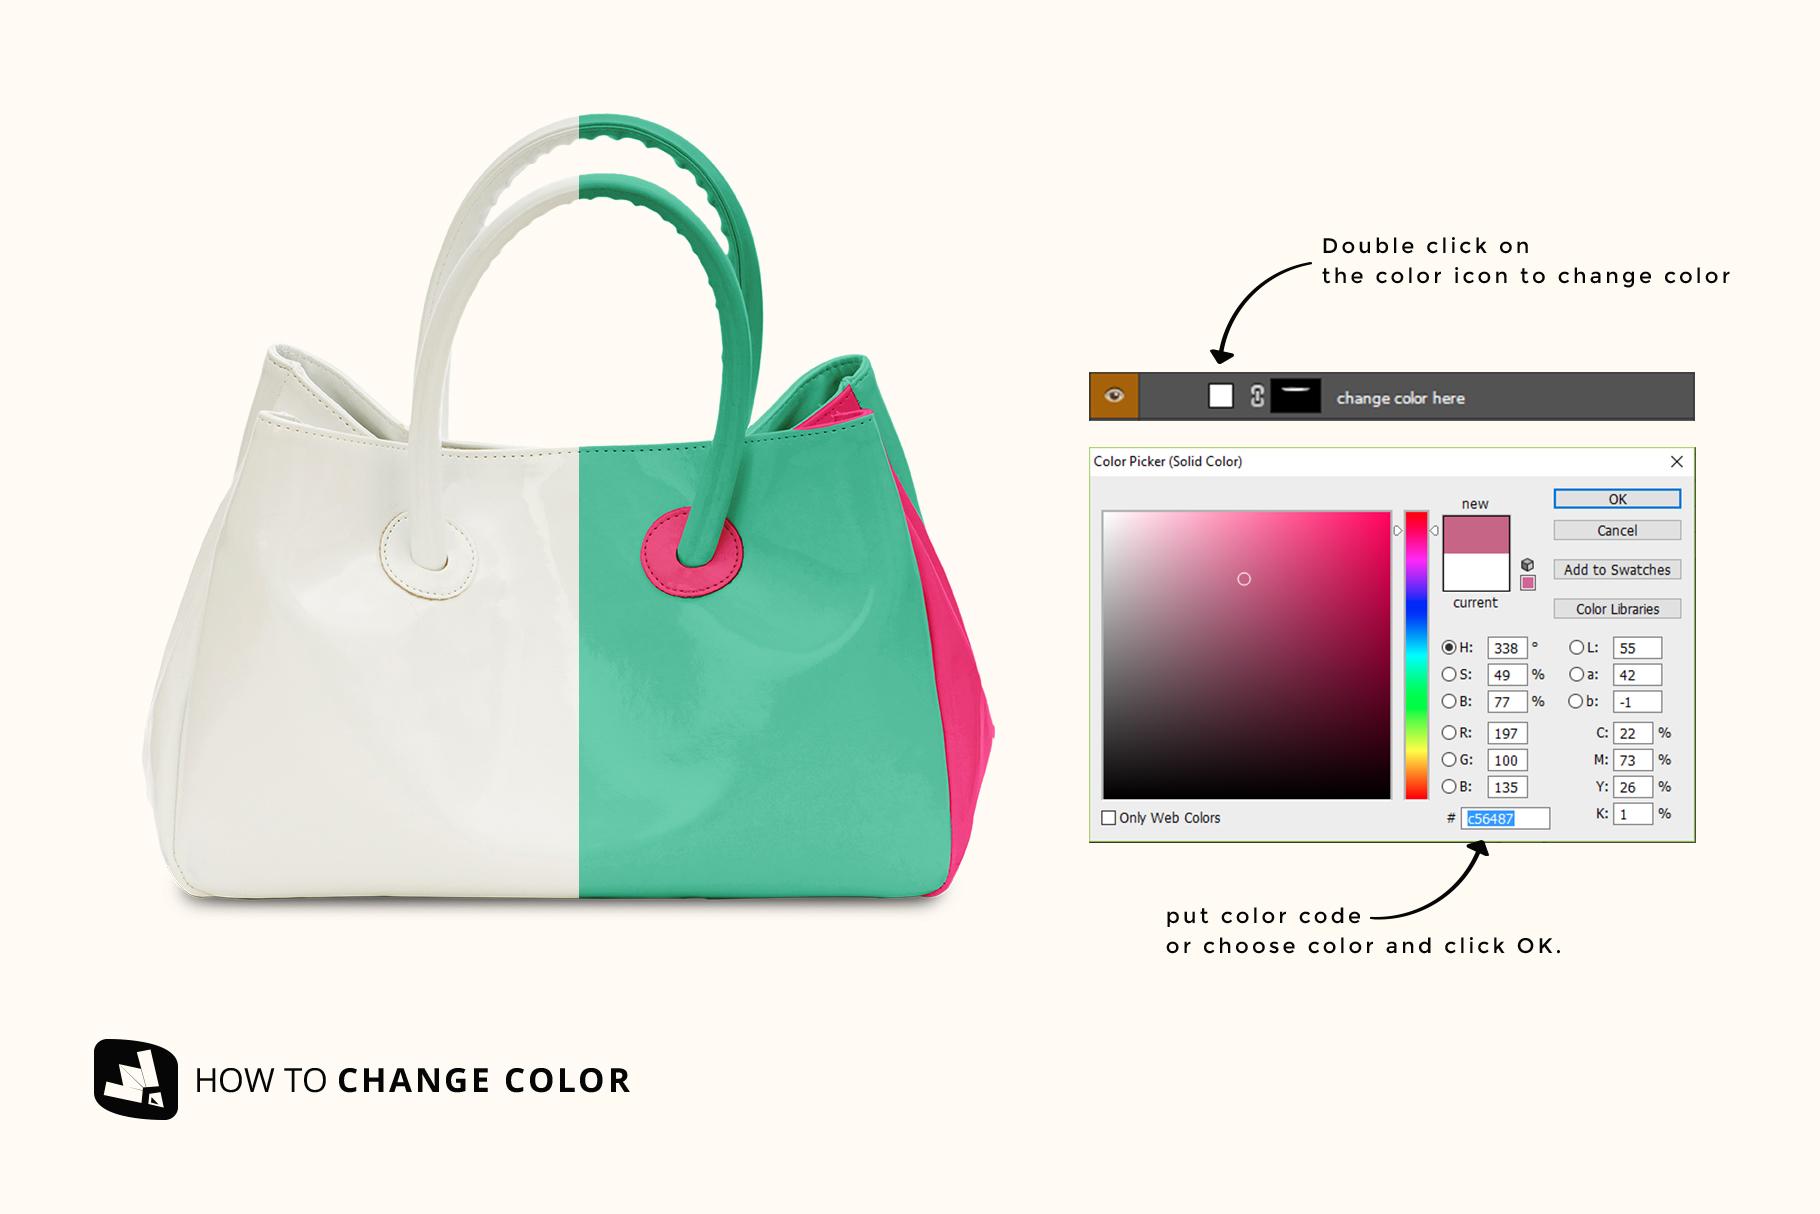 how to change color of the female handbag mockup